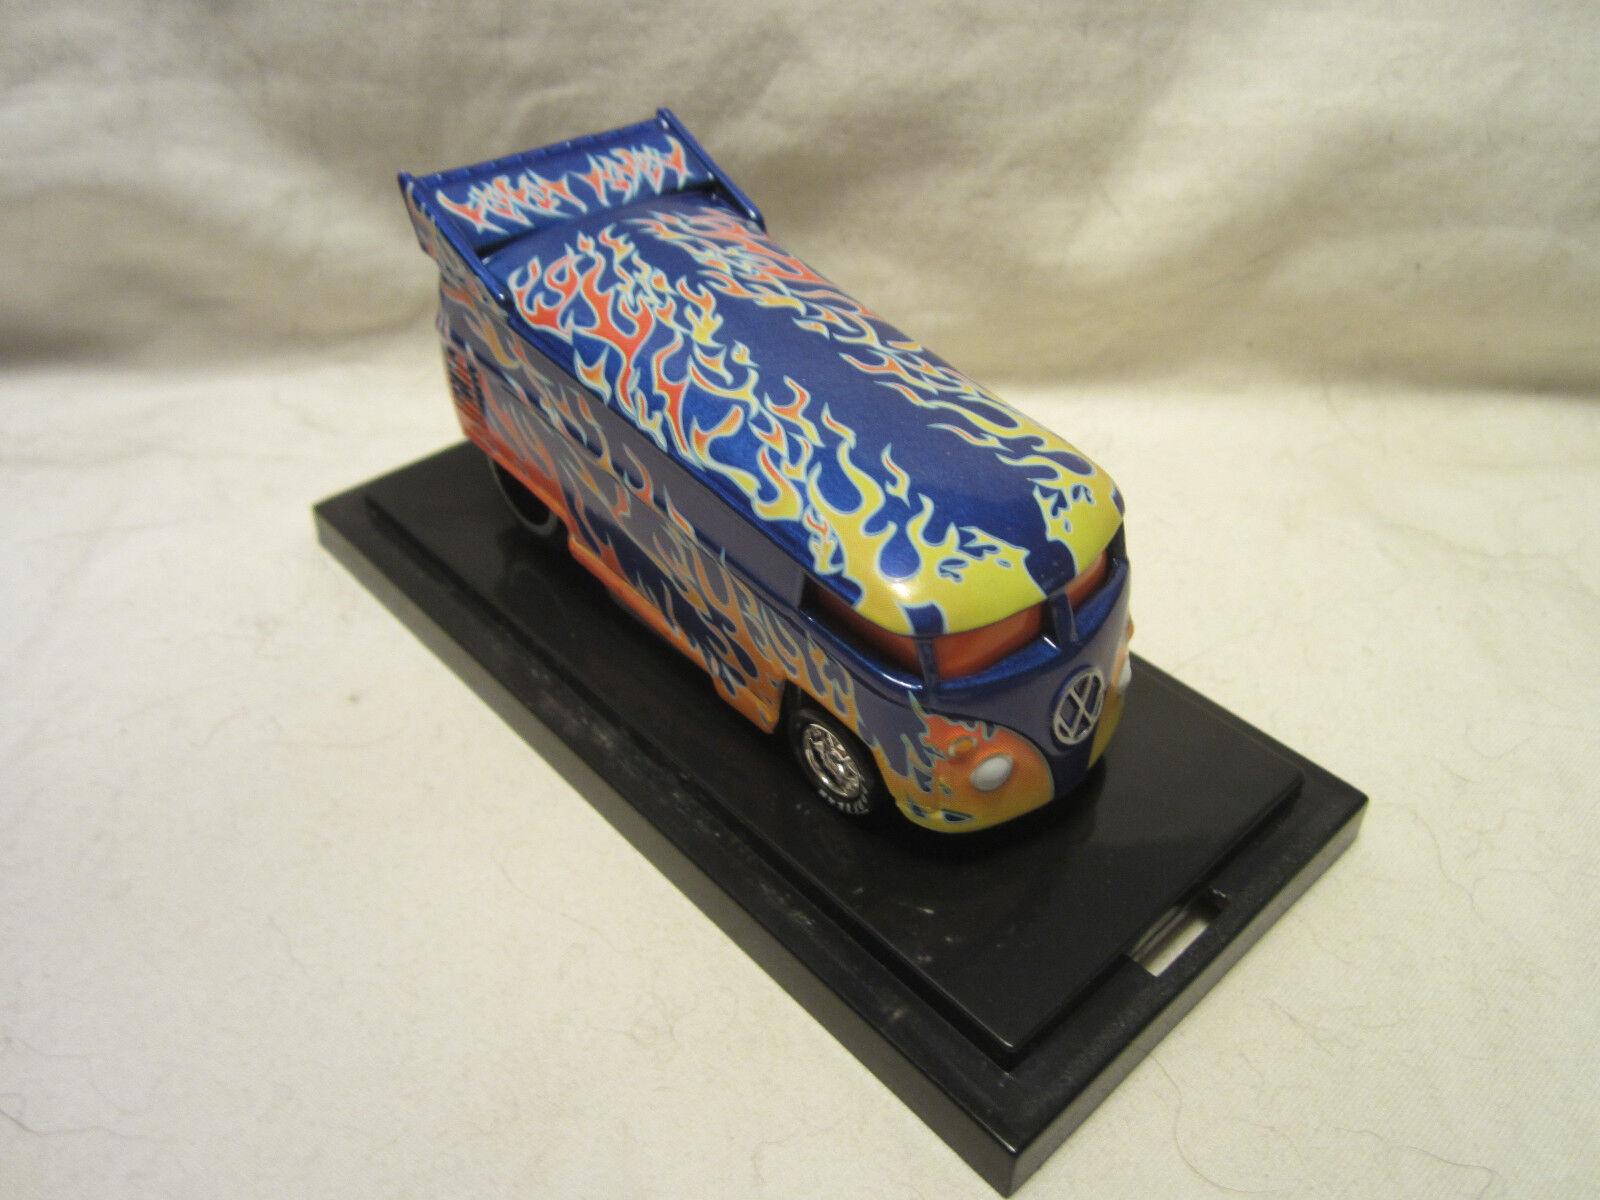 Hot Wheels Liberty Promotions Superflames Series VW DRAG BUS-1 Blazin' 207 1300